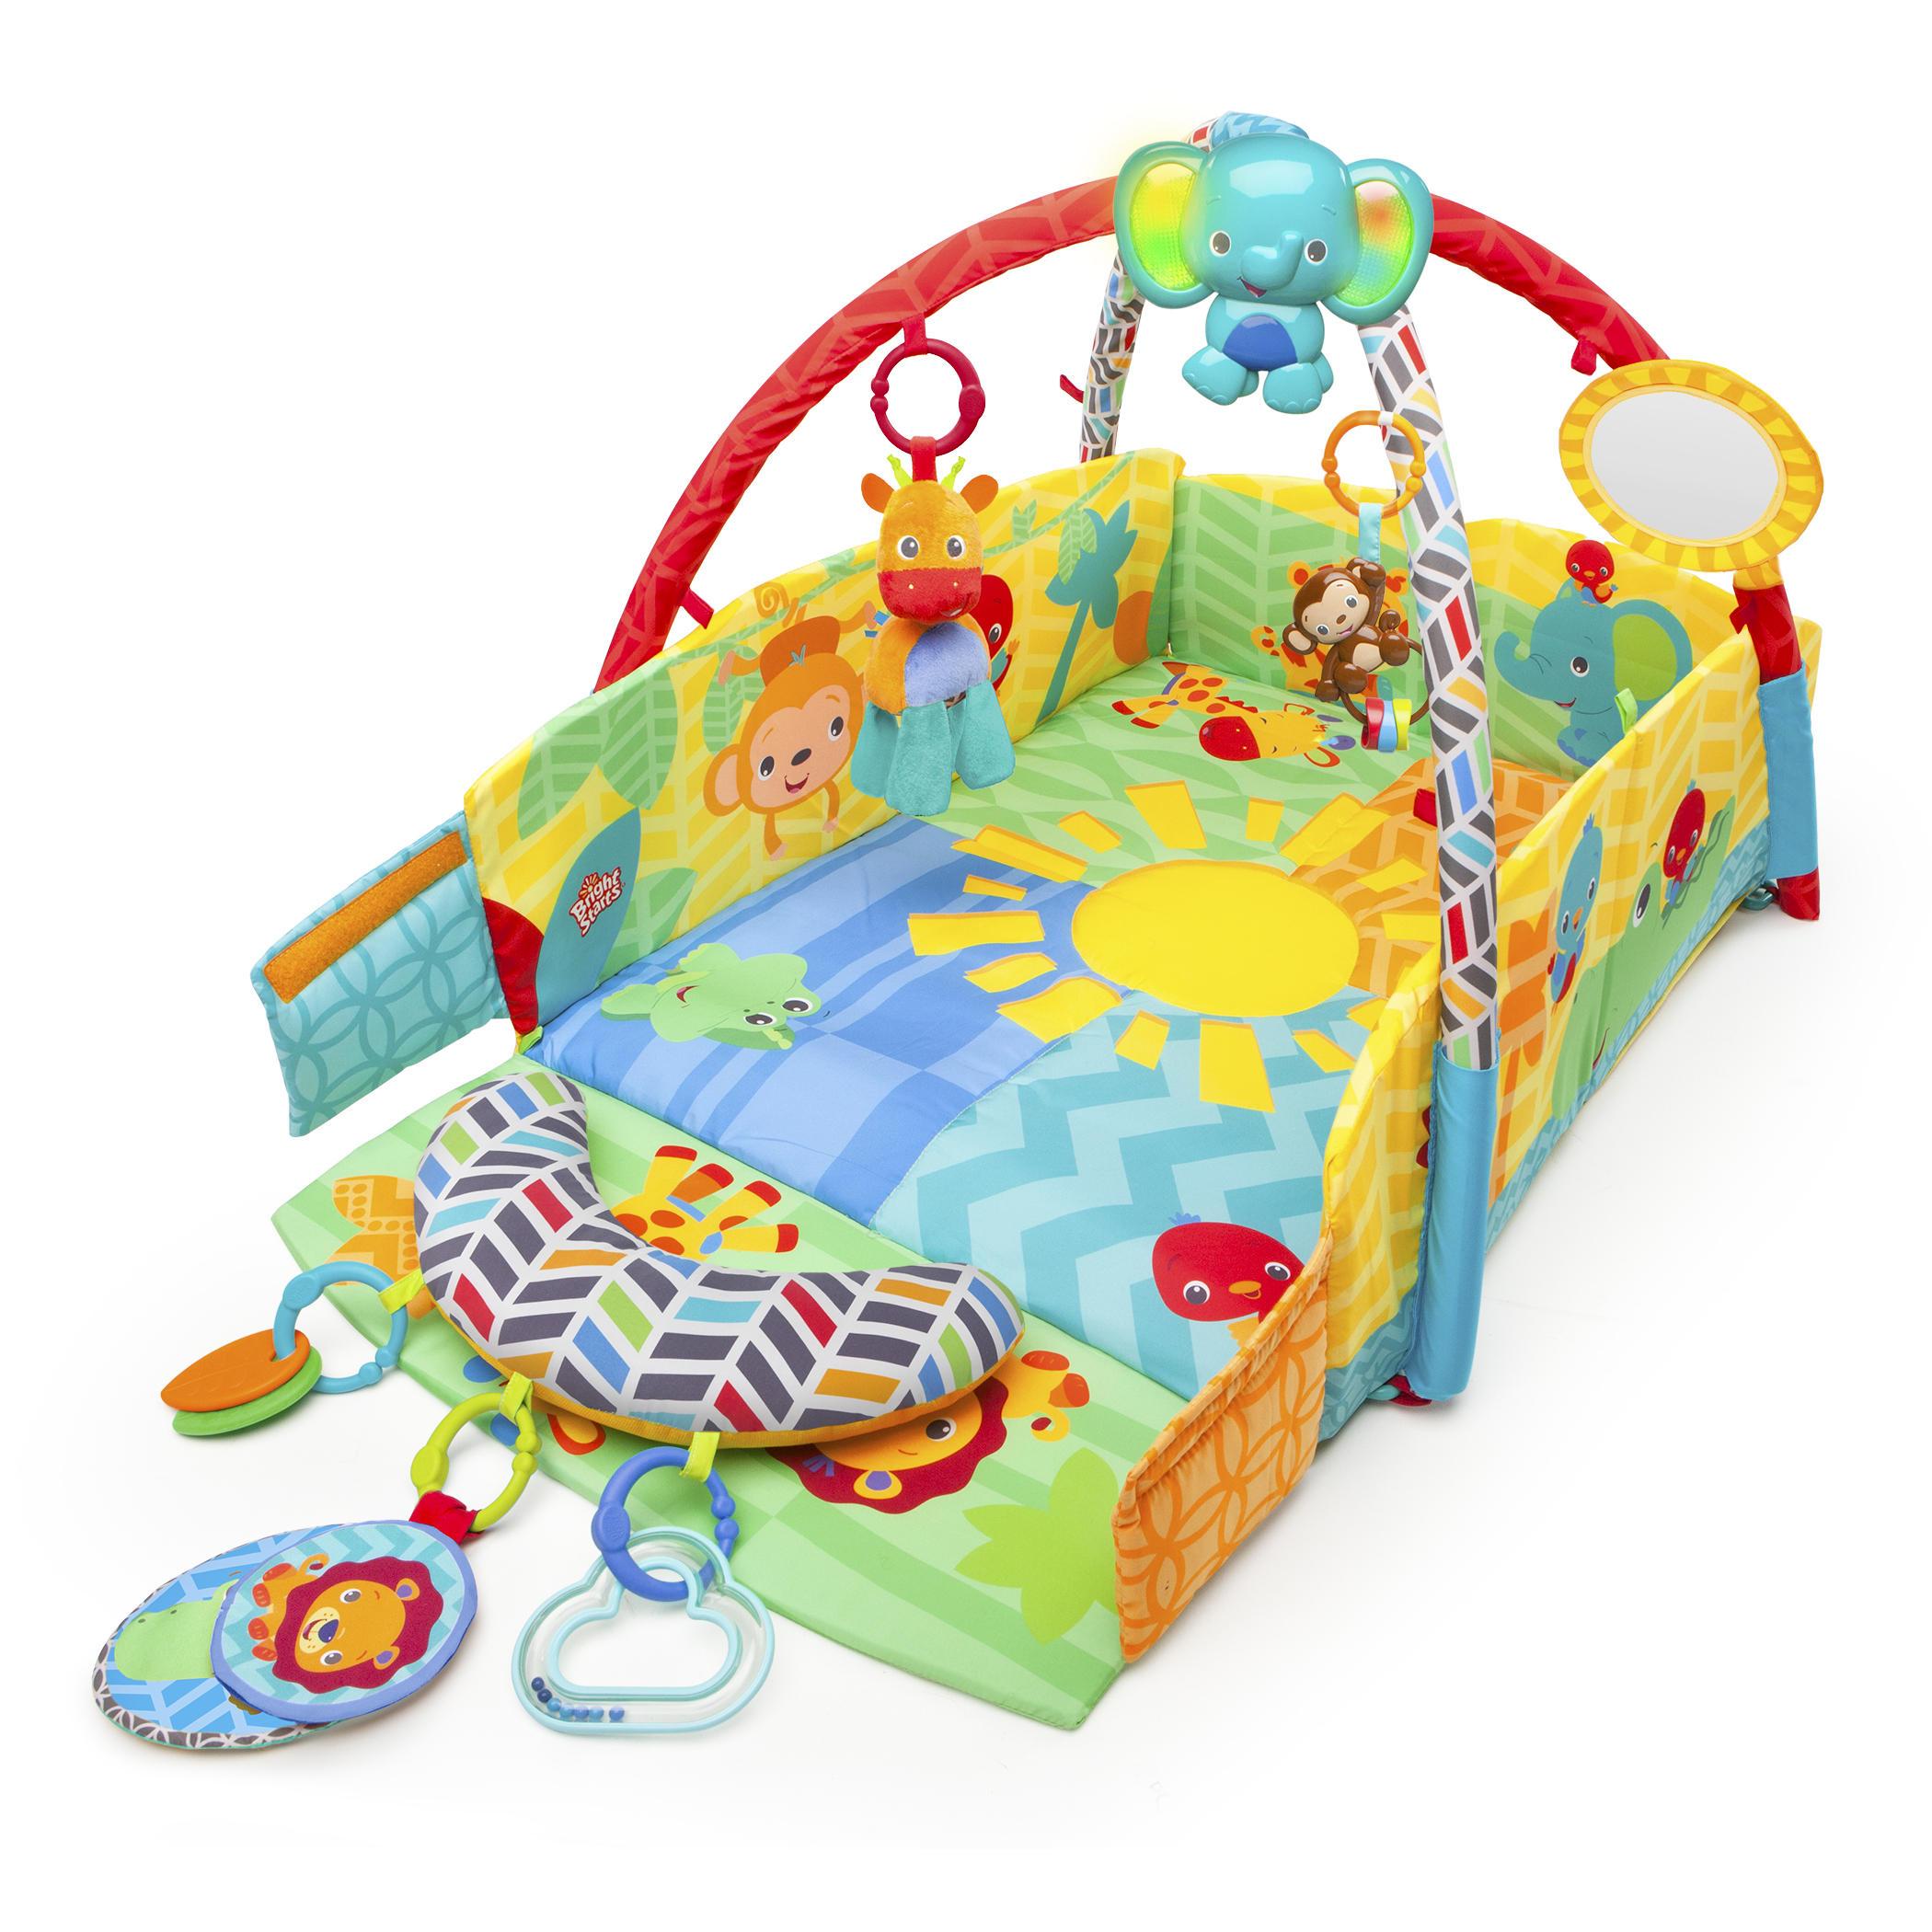 Sunny Safari™ Baby's Play Place™ Activity Gym